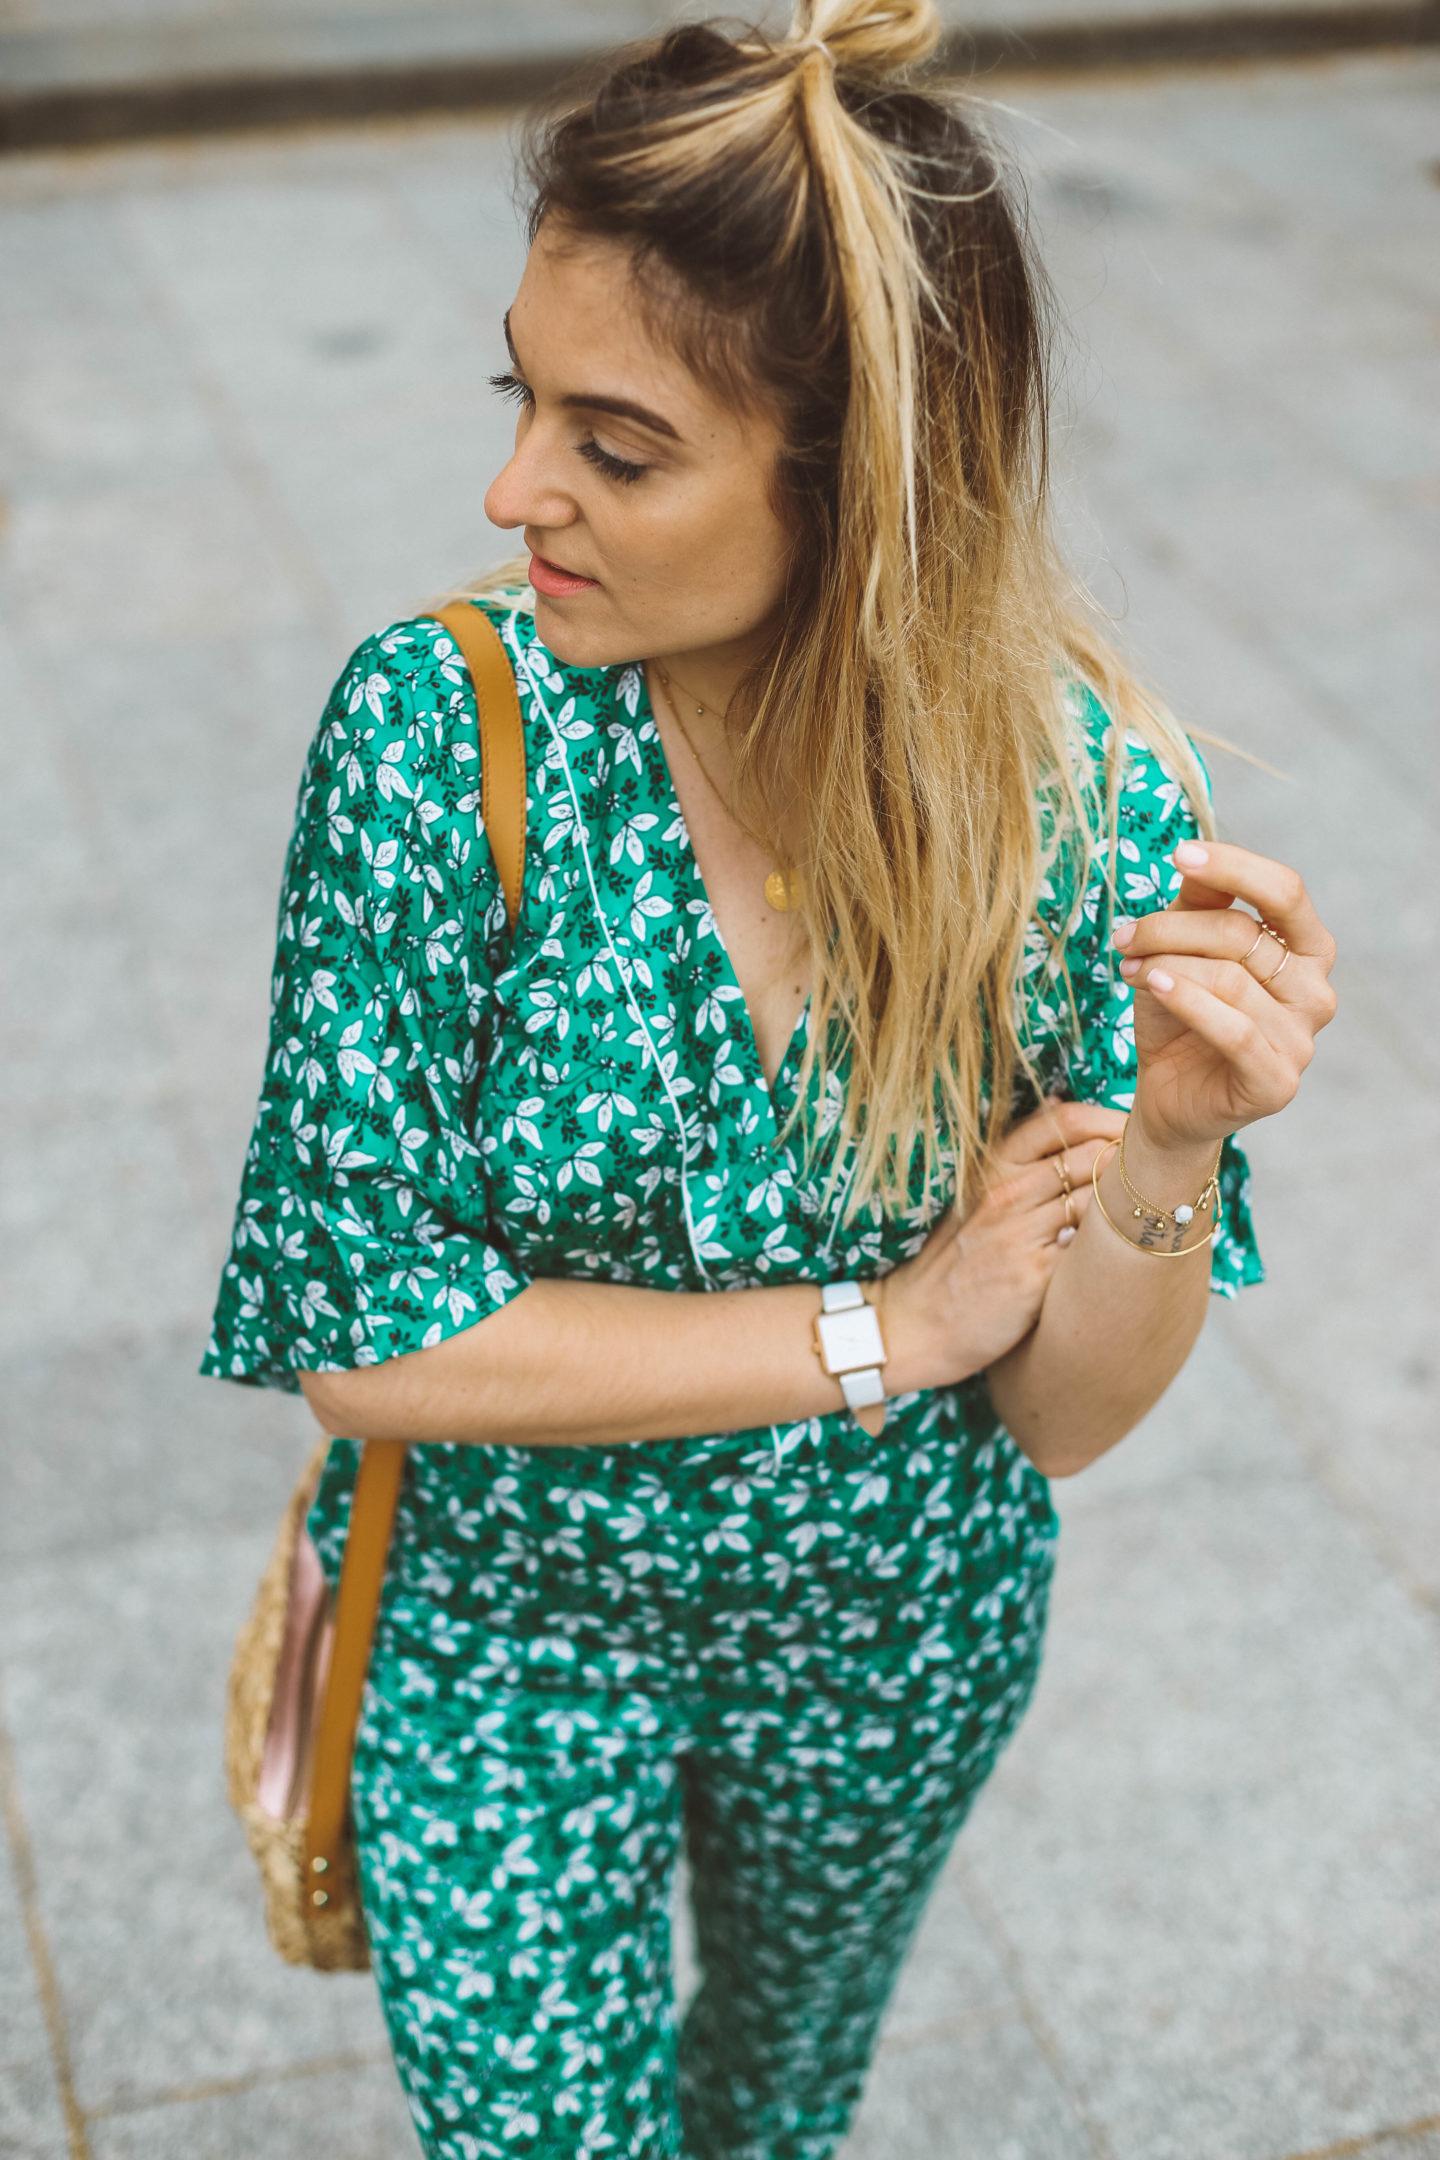 Bijoux Louyetu - Blondie Baby blog Paris mode et voyages